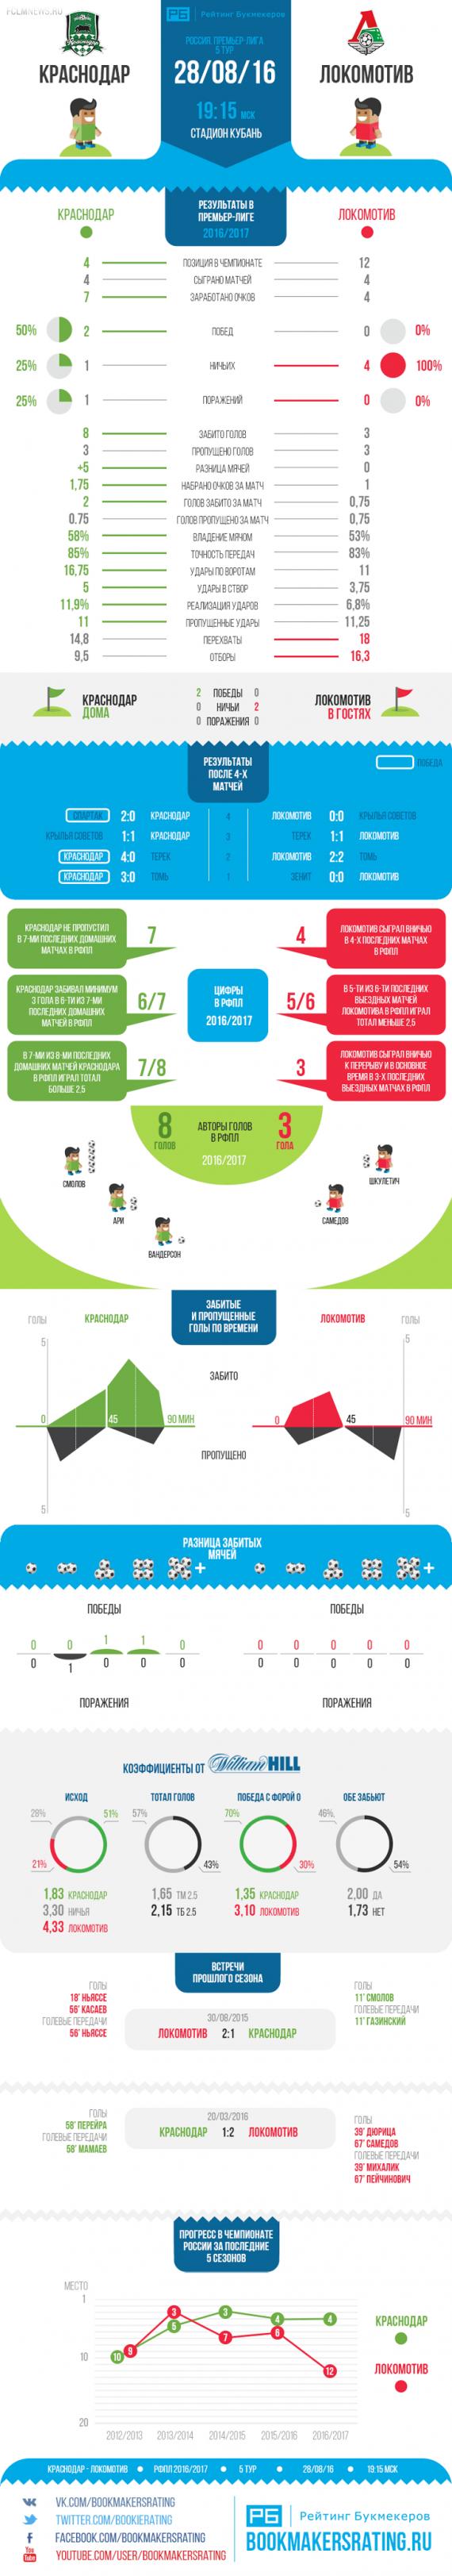 Статистика для матча «Краснодар» — «Локомотив» от «Рейтинга Букмекеров»